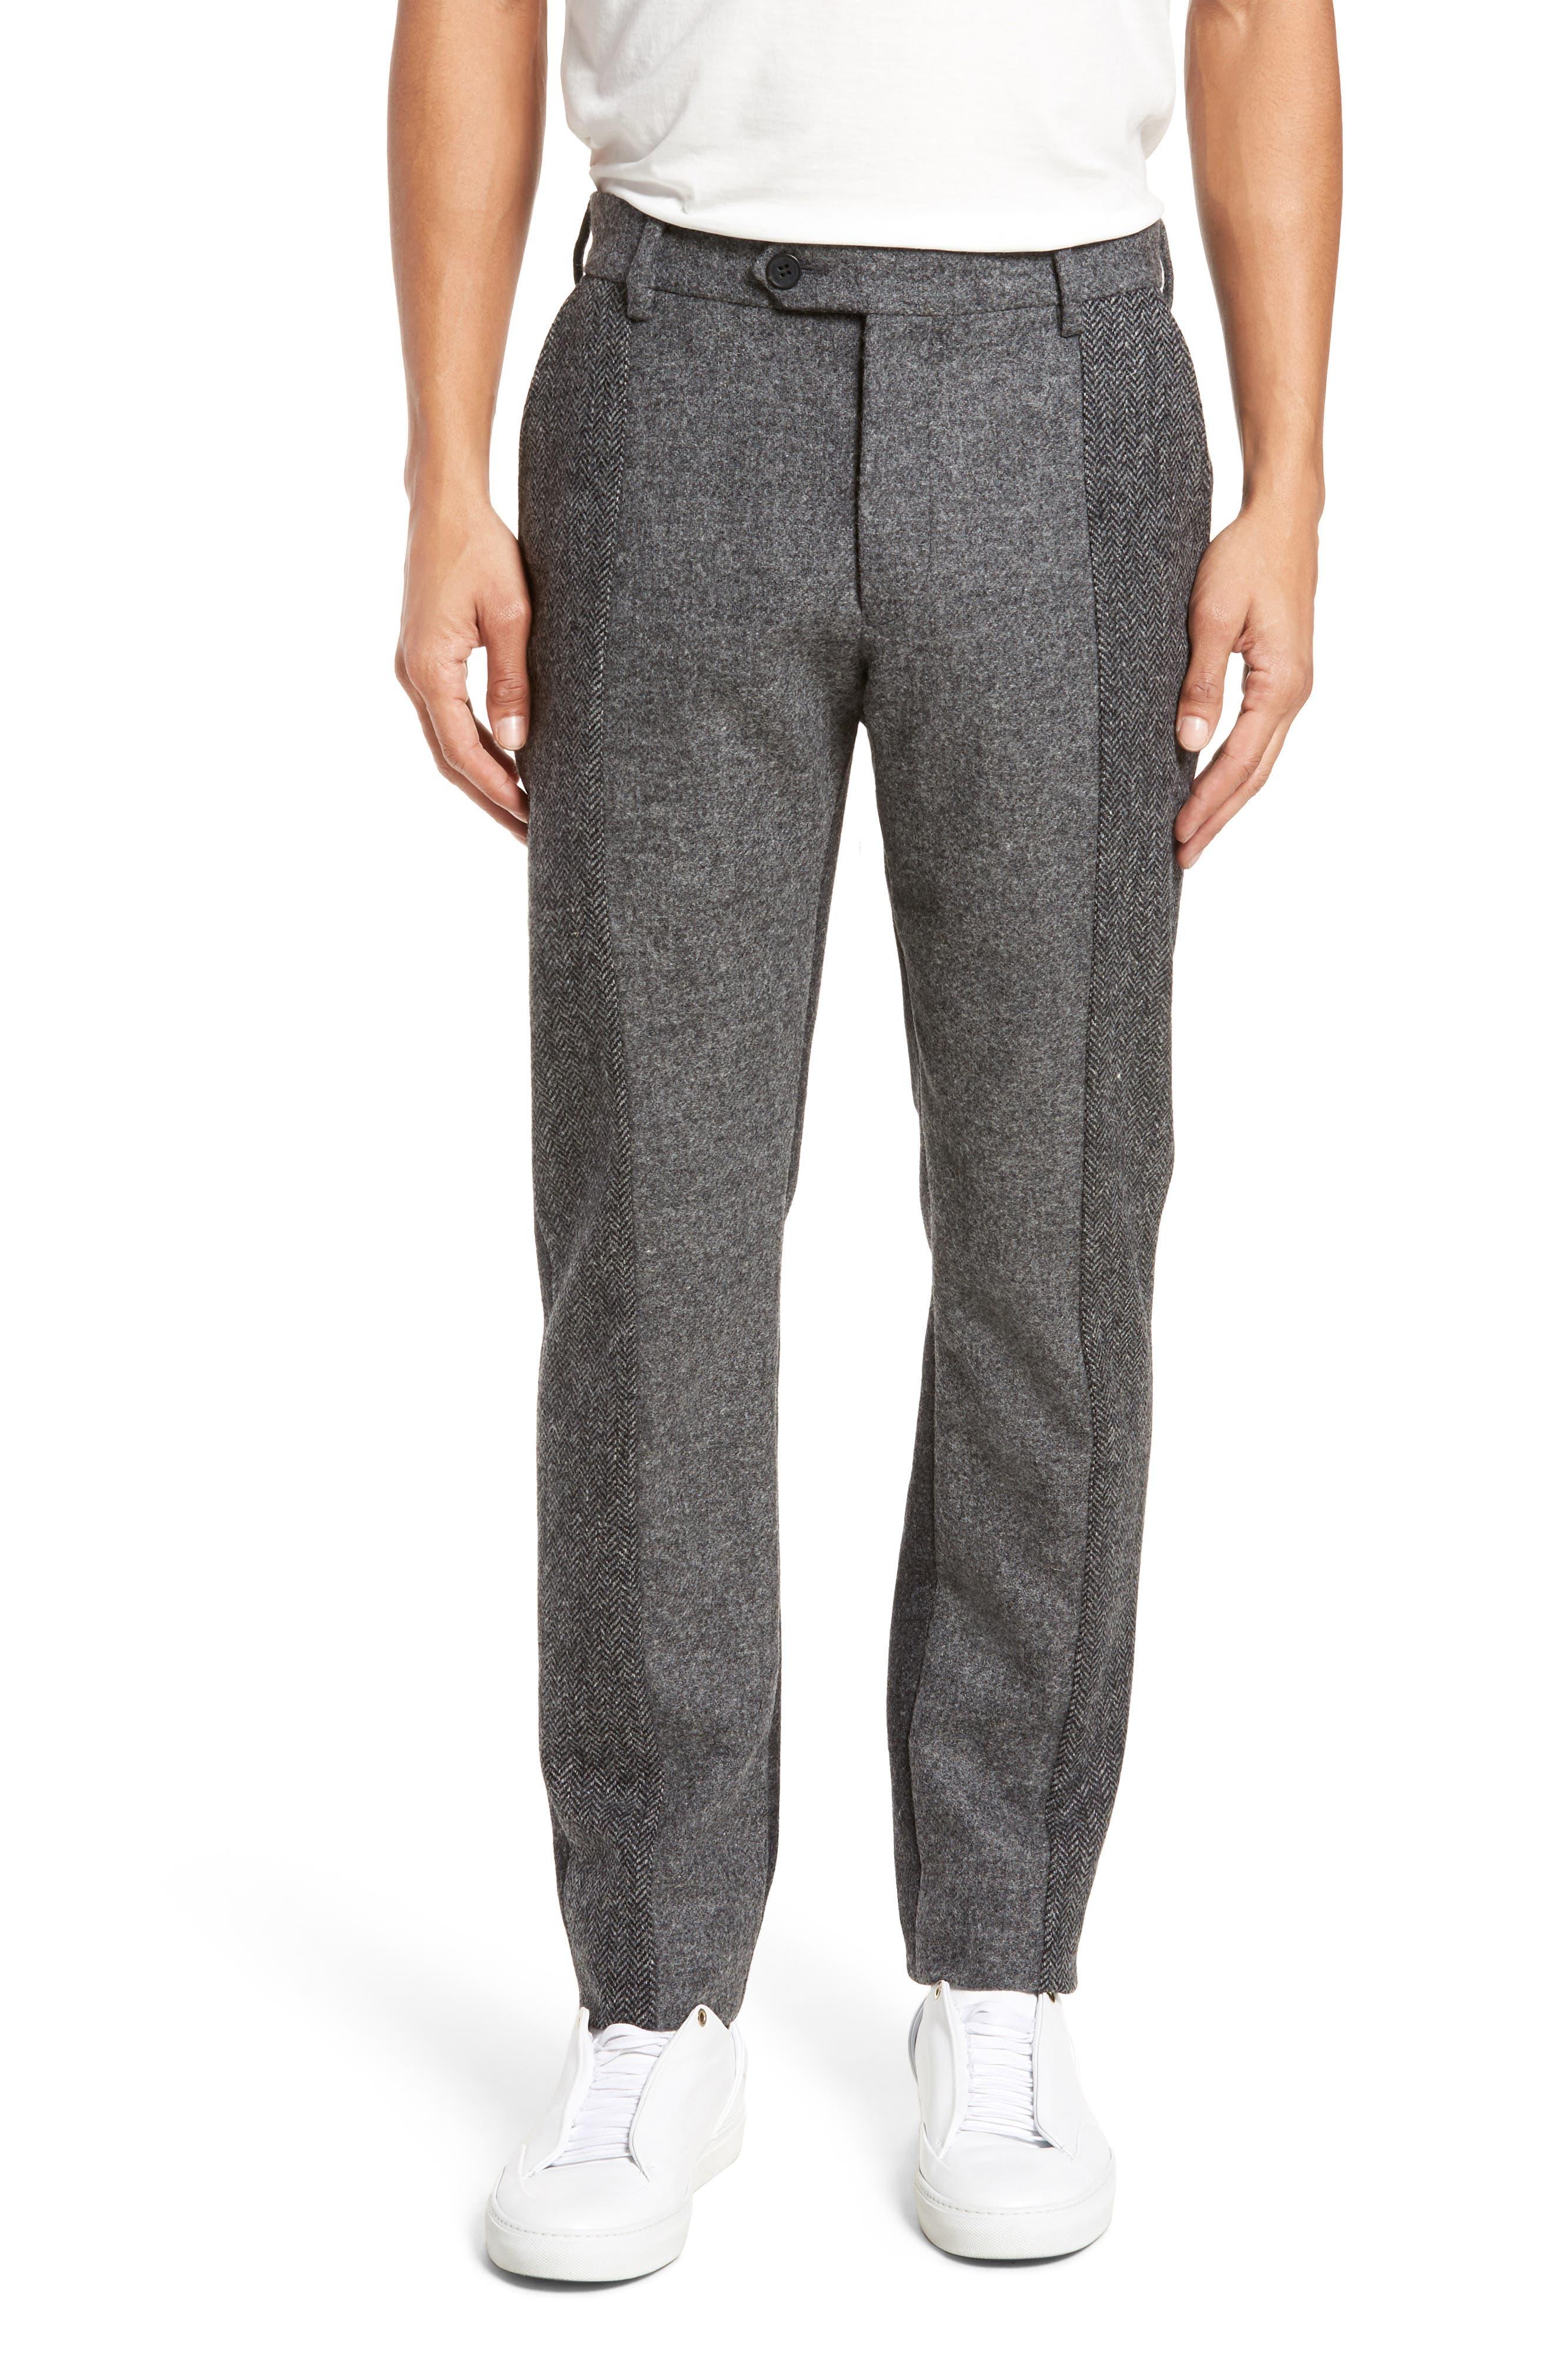 Patchwork Wool Trousers,                             Main thumbnail 1, color,                             Grey Melange